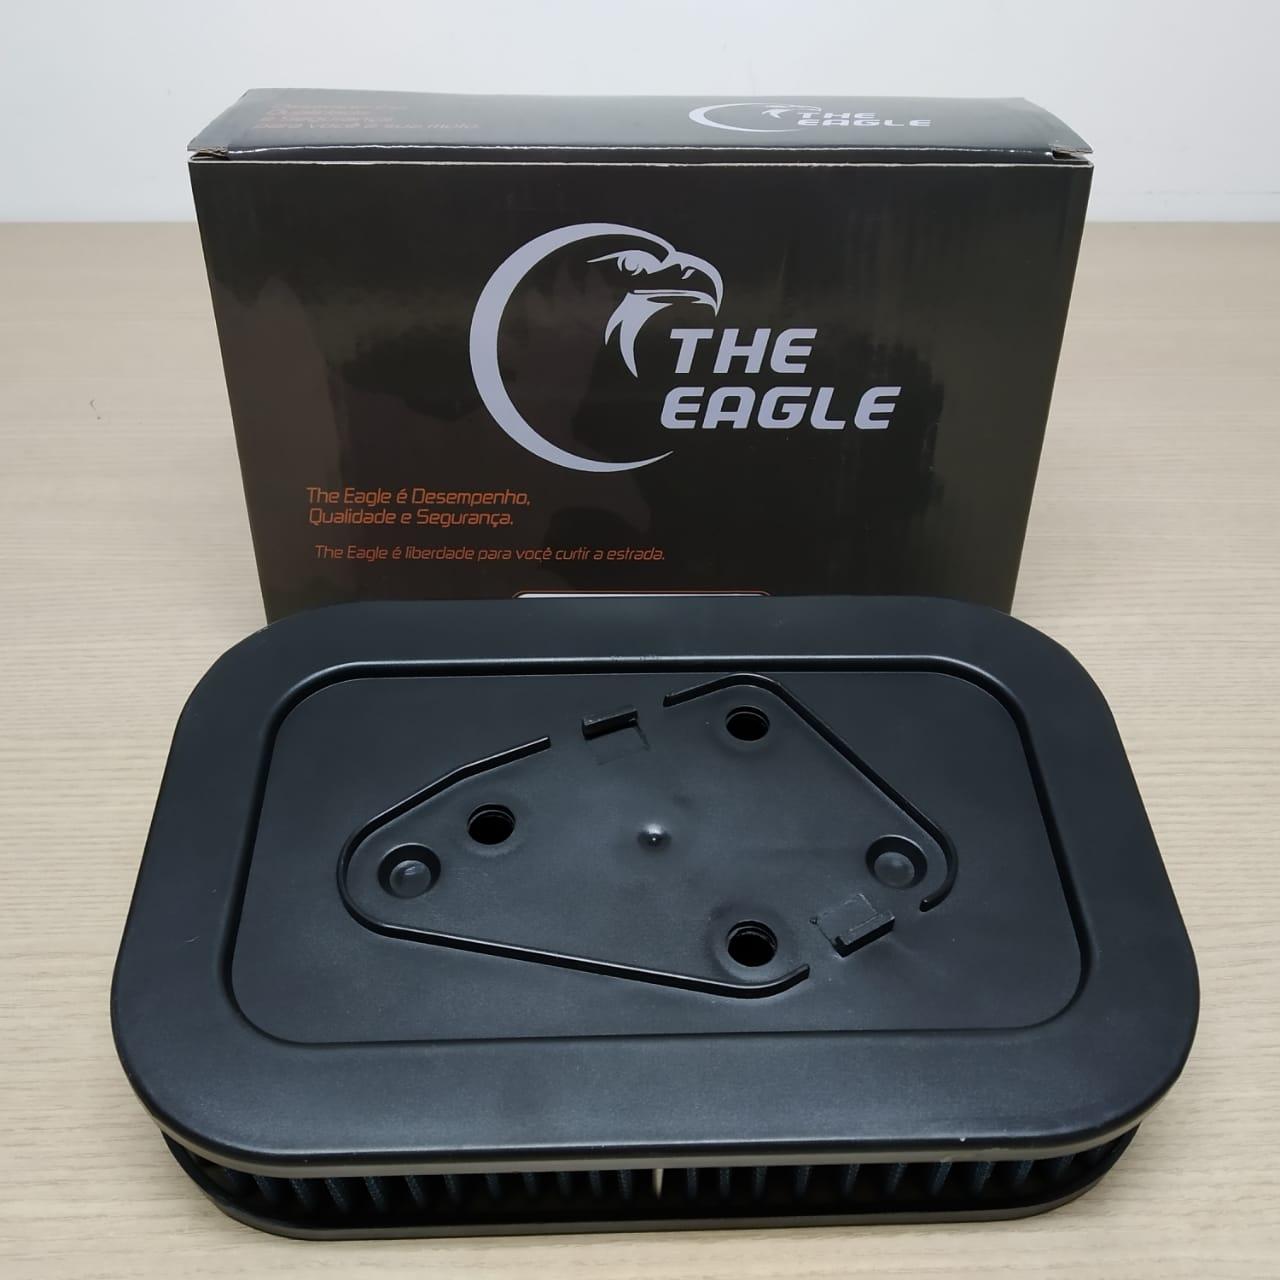 TE 1004 - Filtro De Ar The Eagle HD Sportster 2004 à 2013 - 016/01172